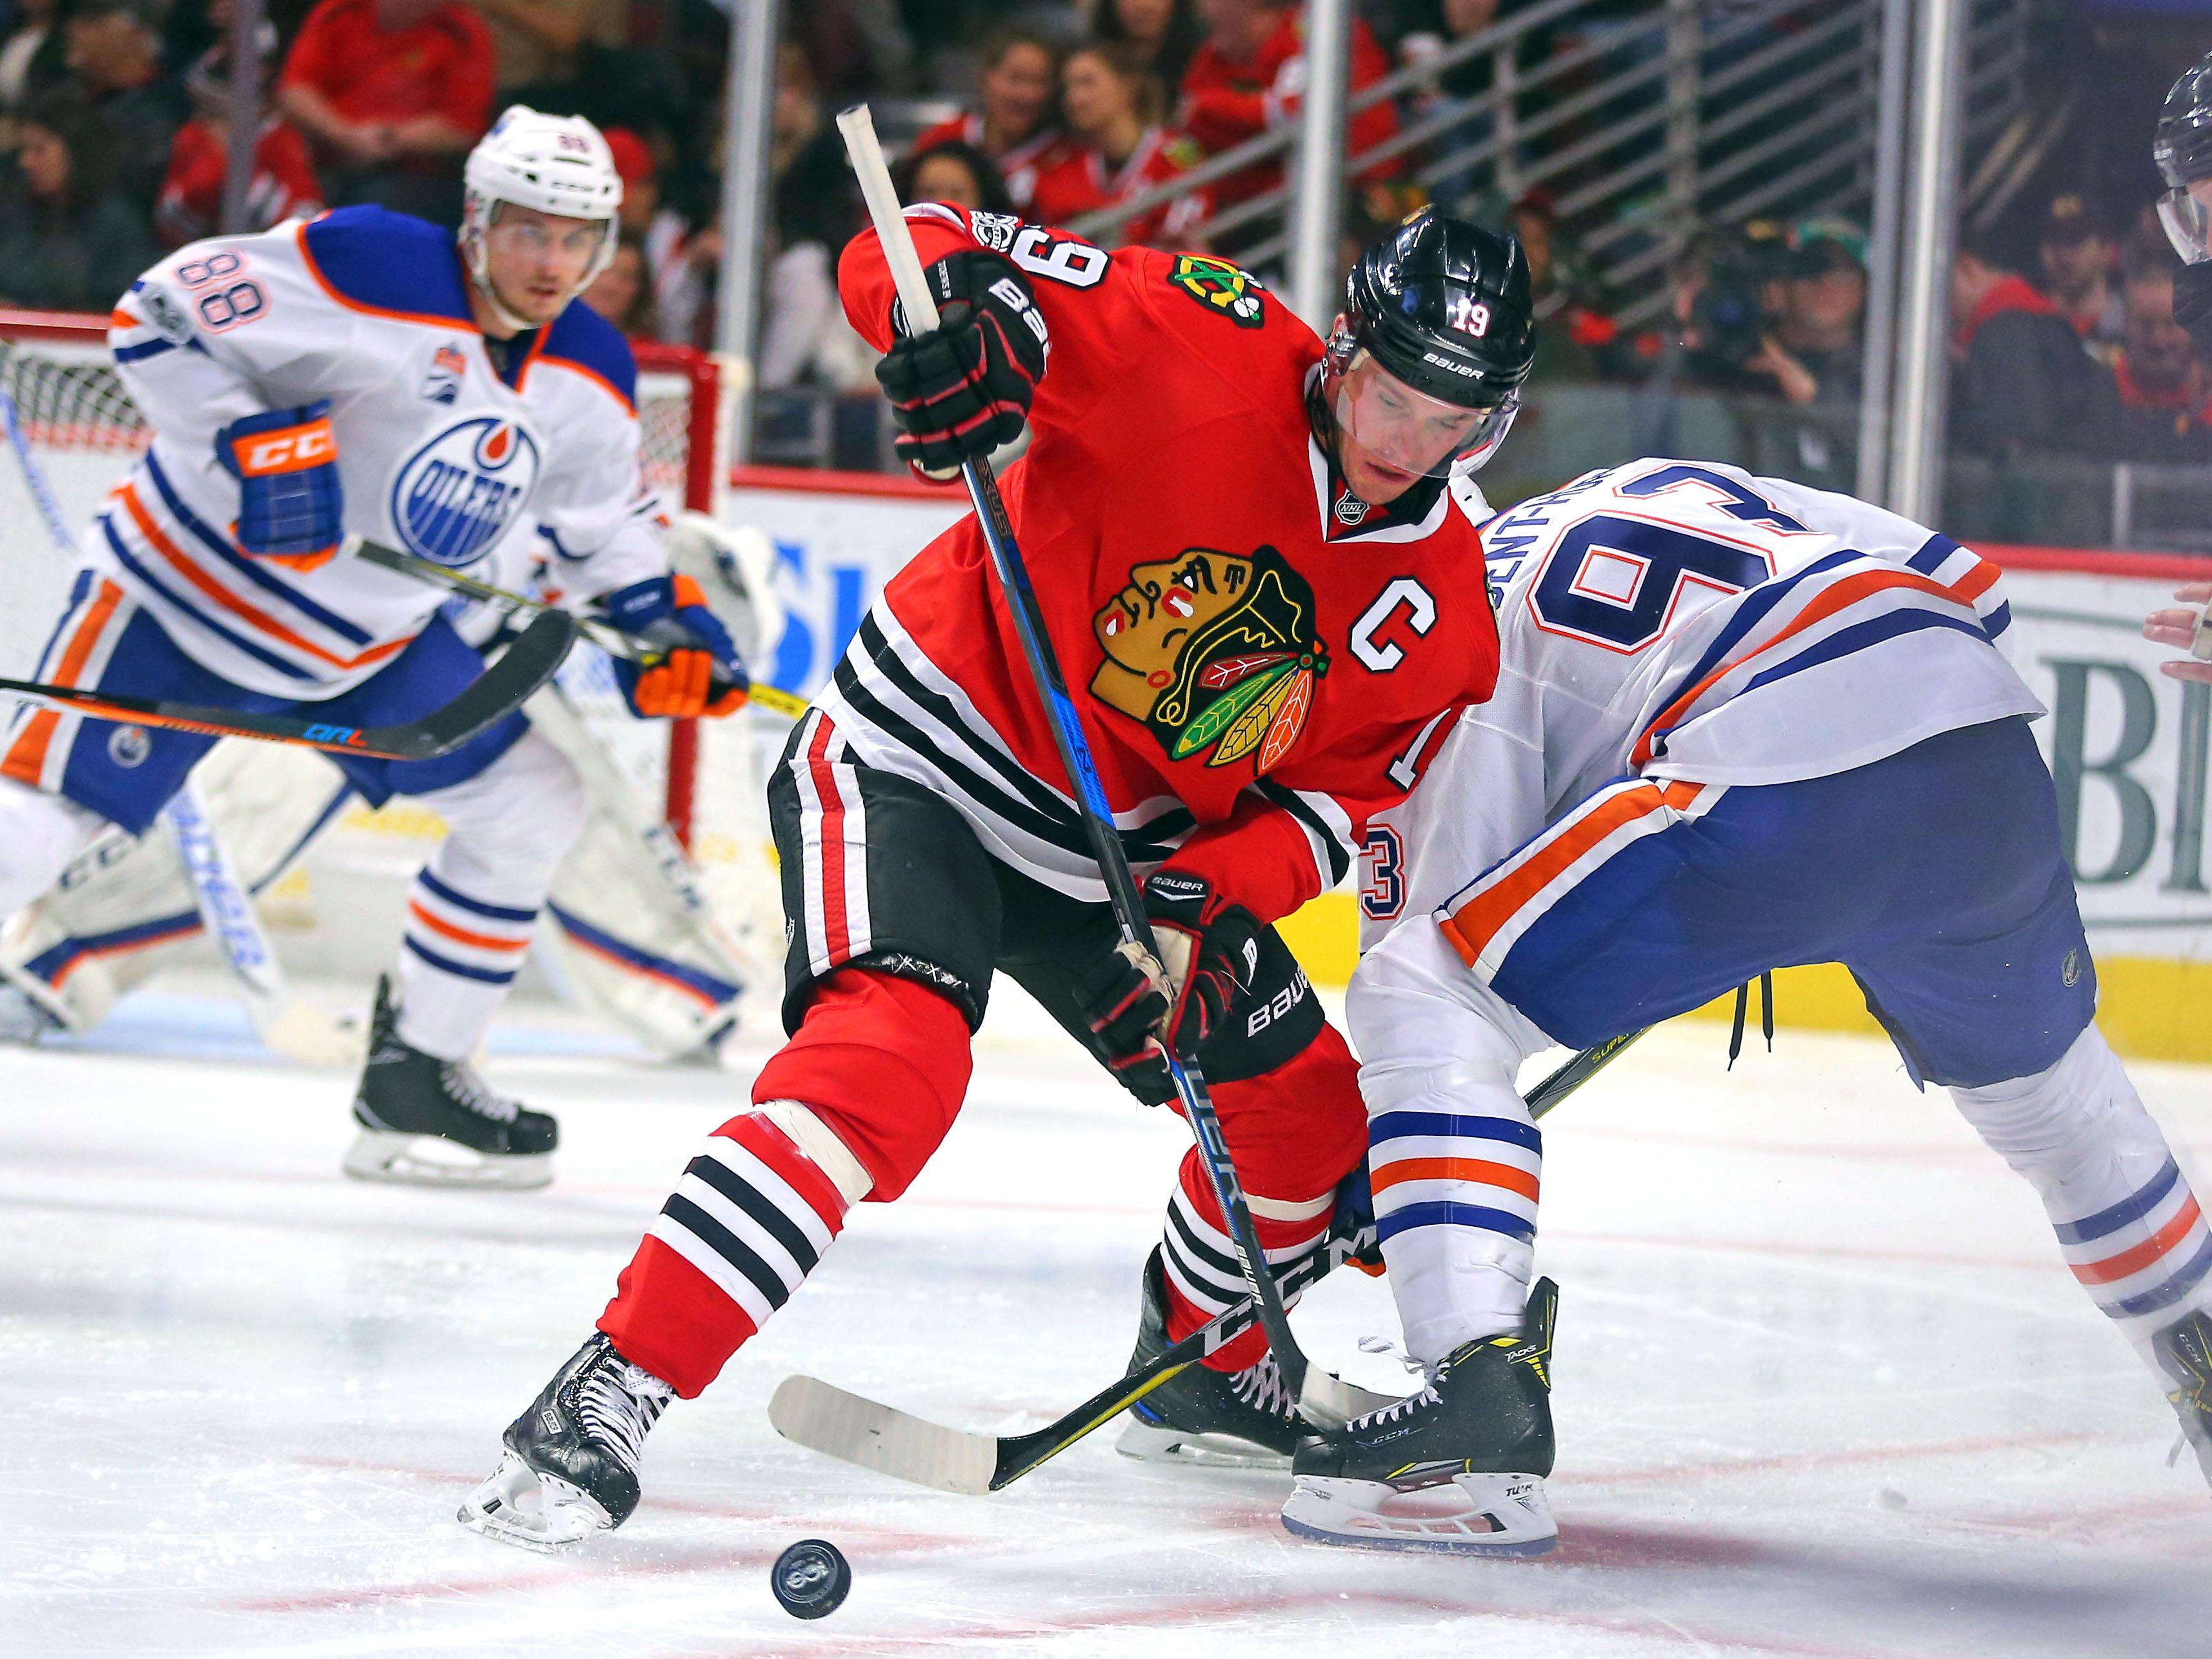 NHL: Edmonton Oilers at Chicago Blackhawks